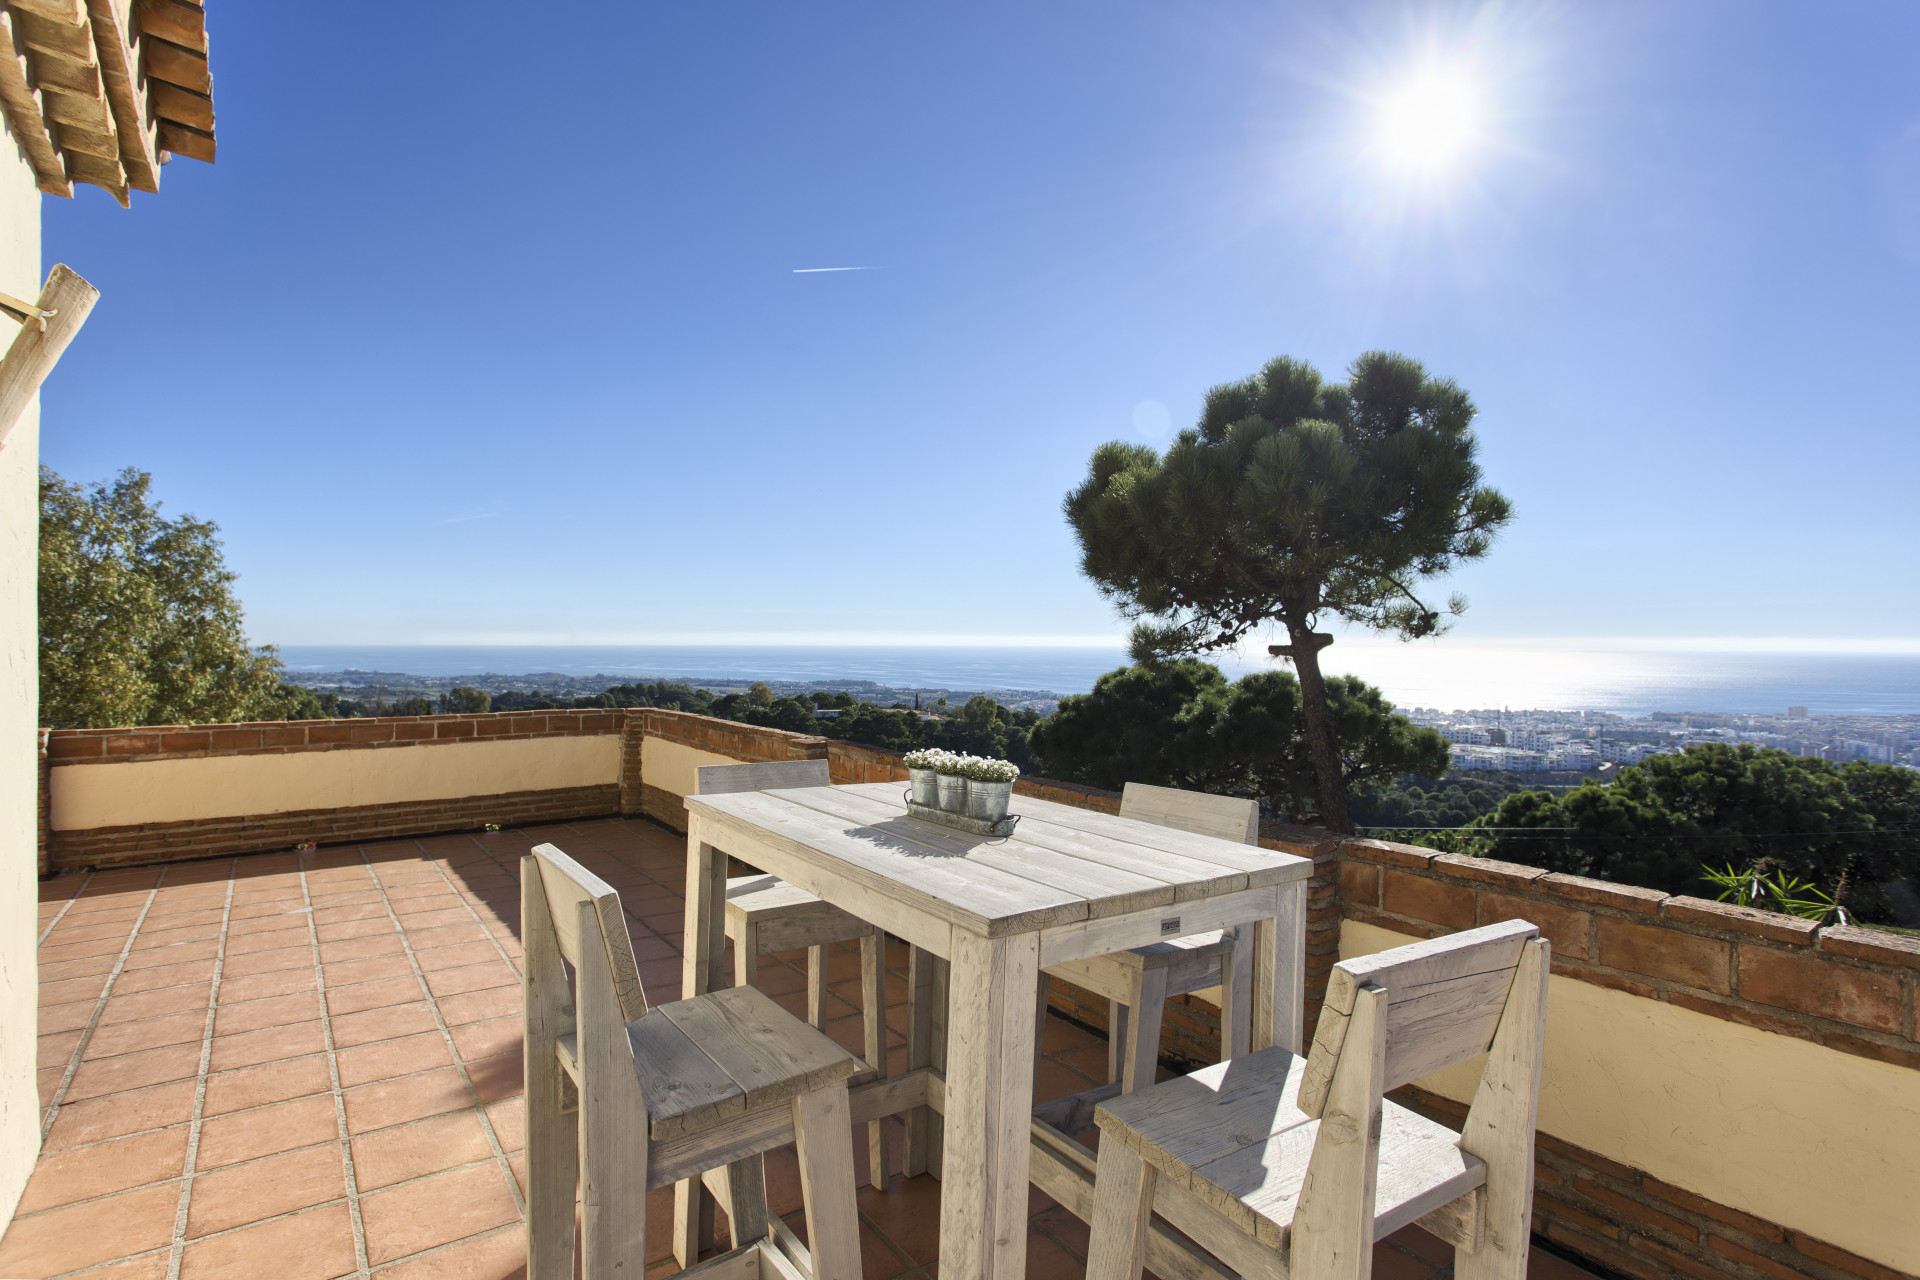 ARFV1577-267 - Traumhafte Villa im Verkauf in Puerta Los Reales in Estepona mit Panoramablick